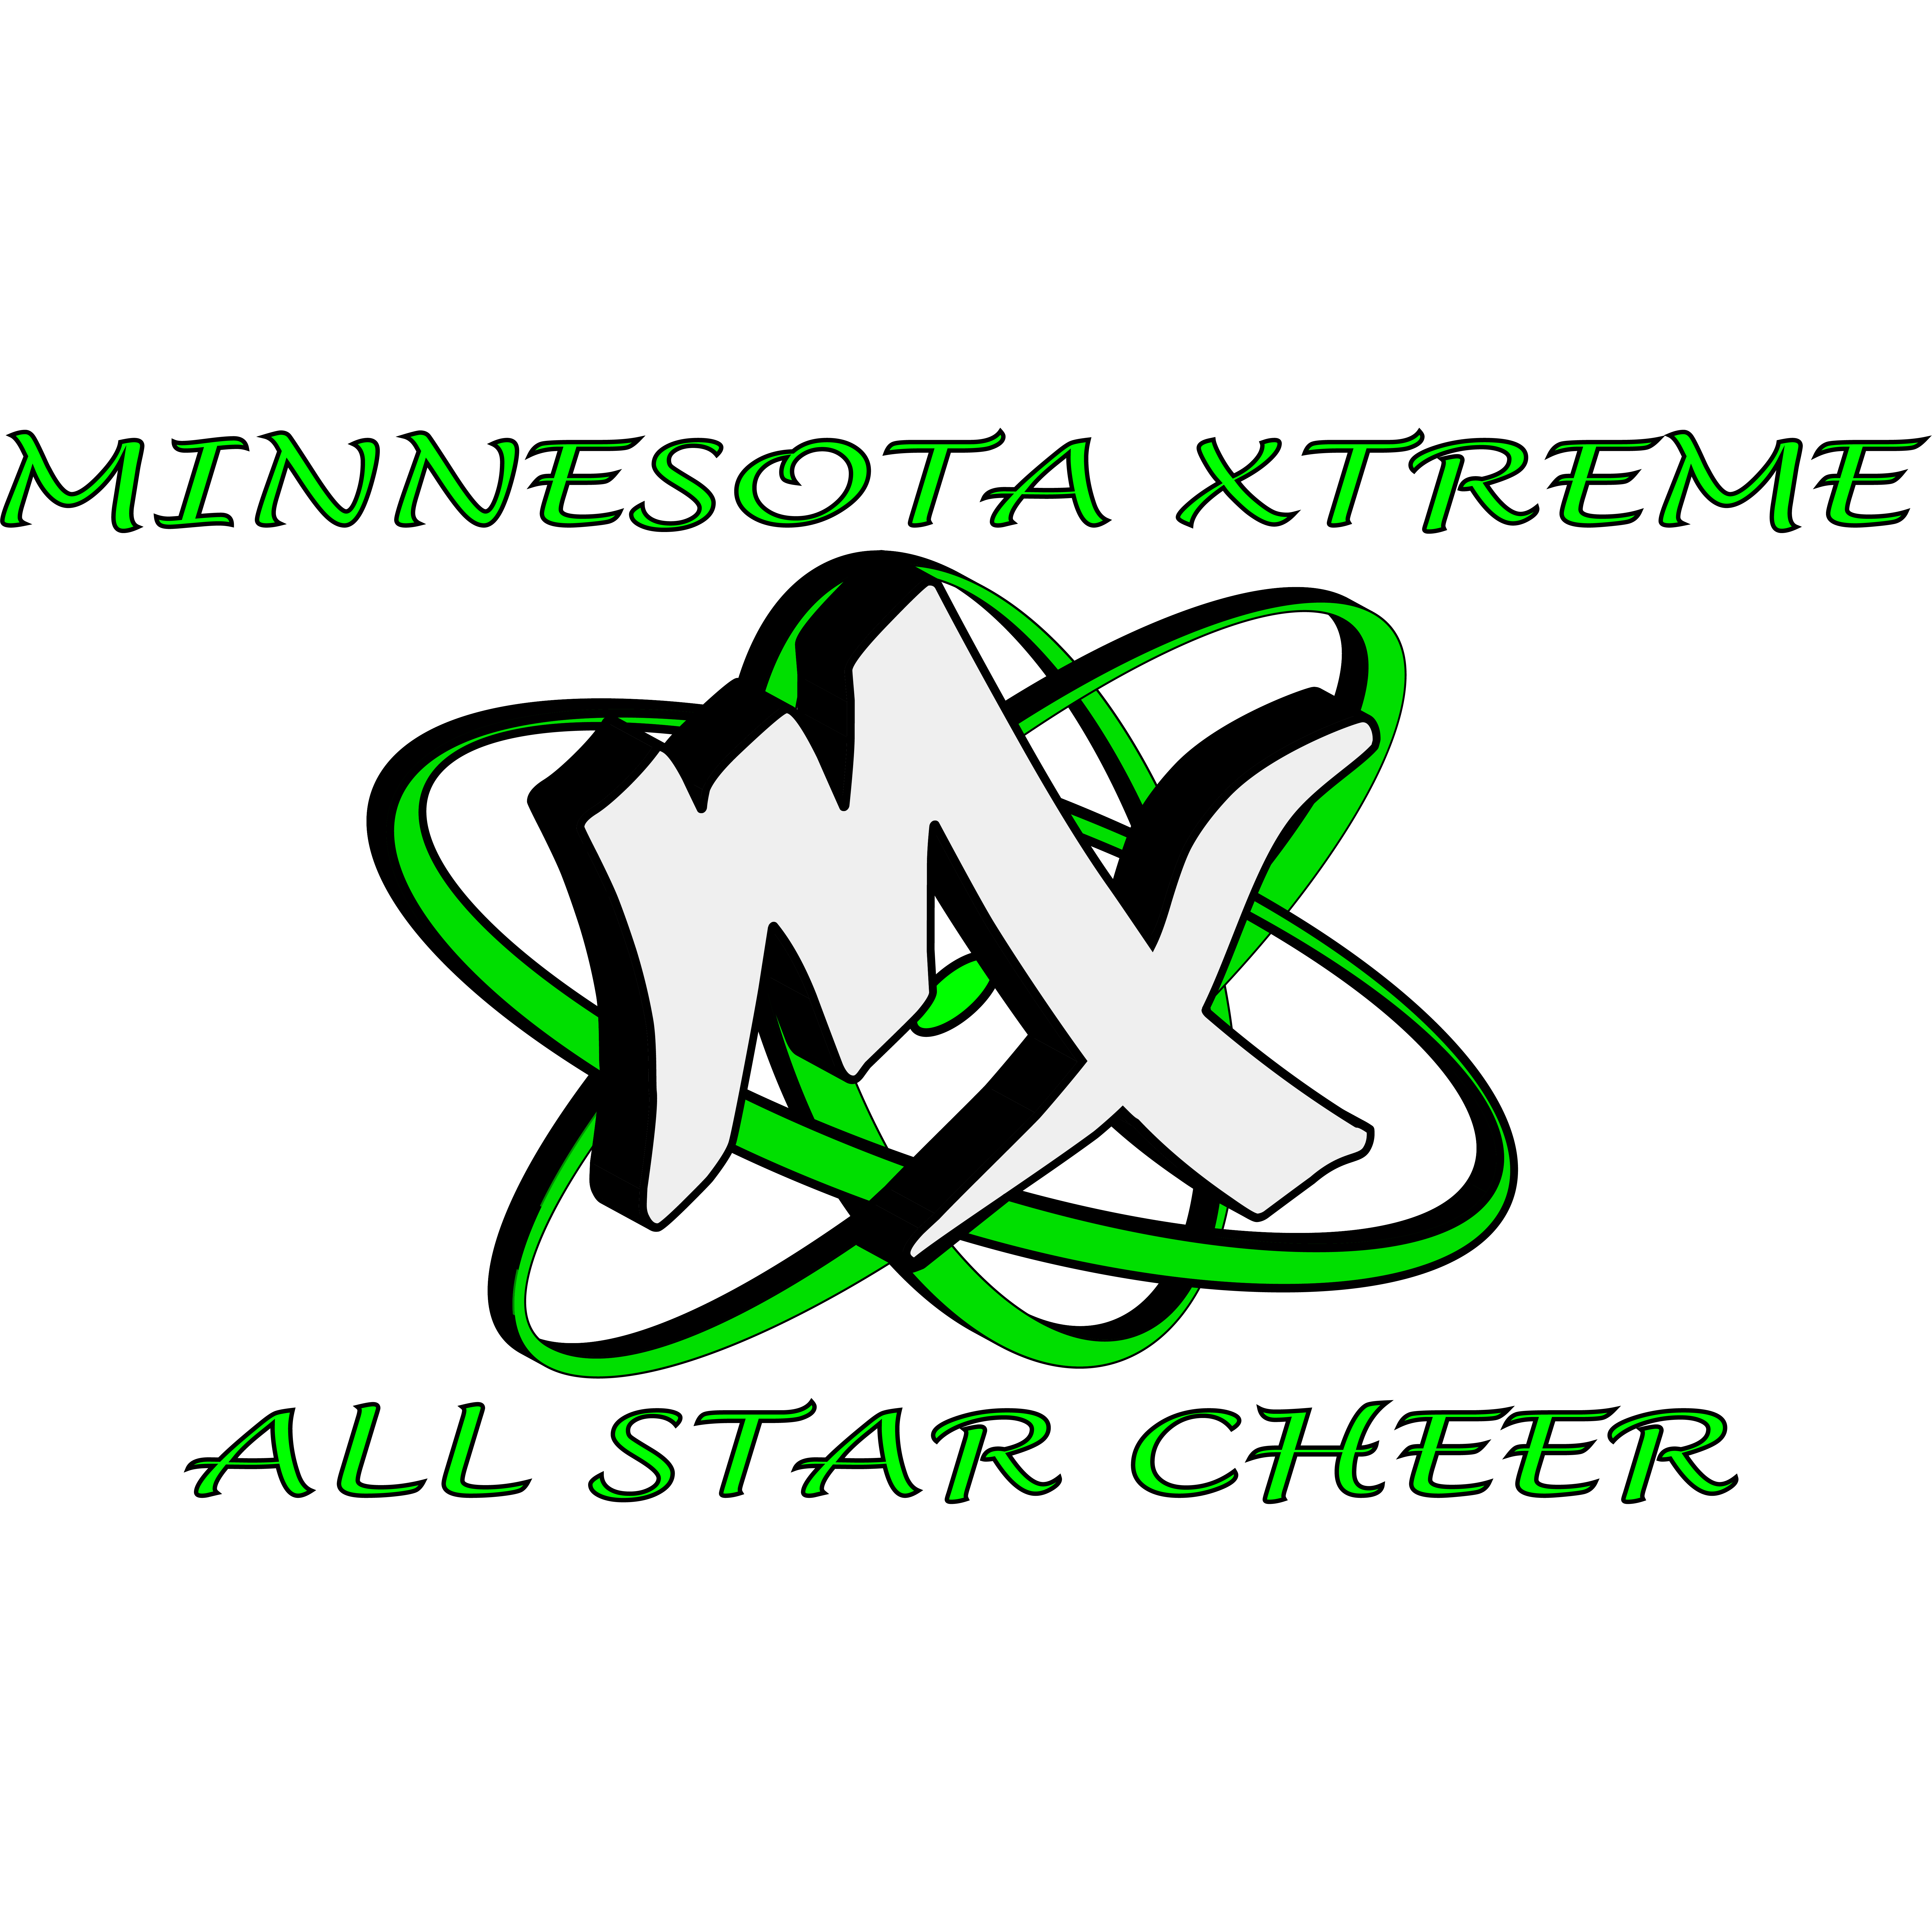 Minnesota Xtreme All Star Cheer